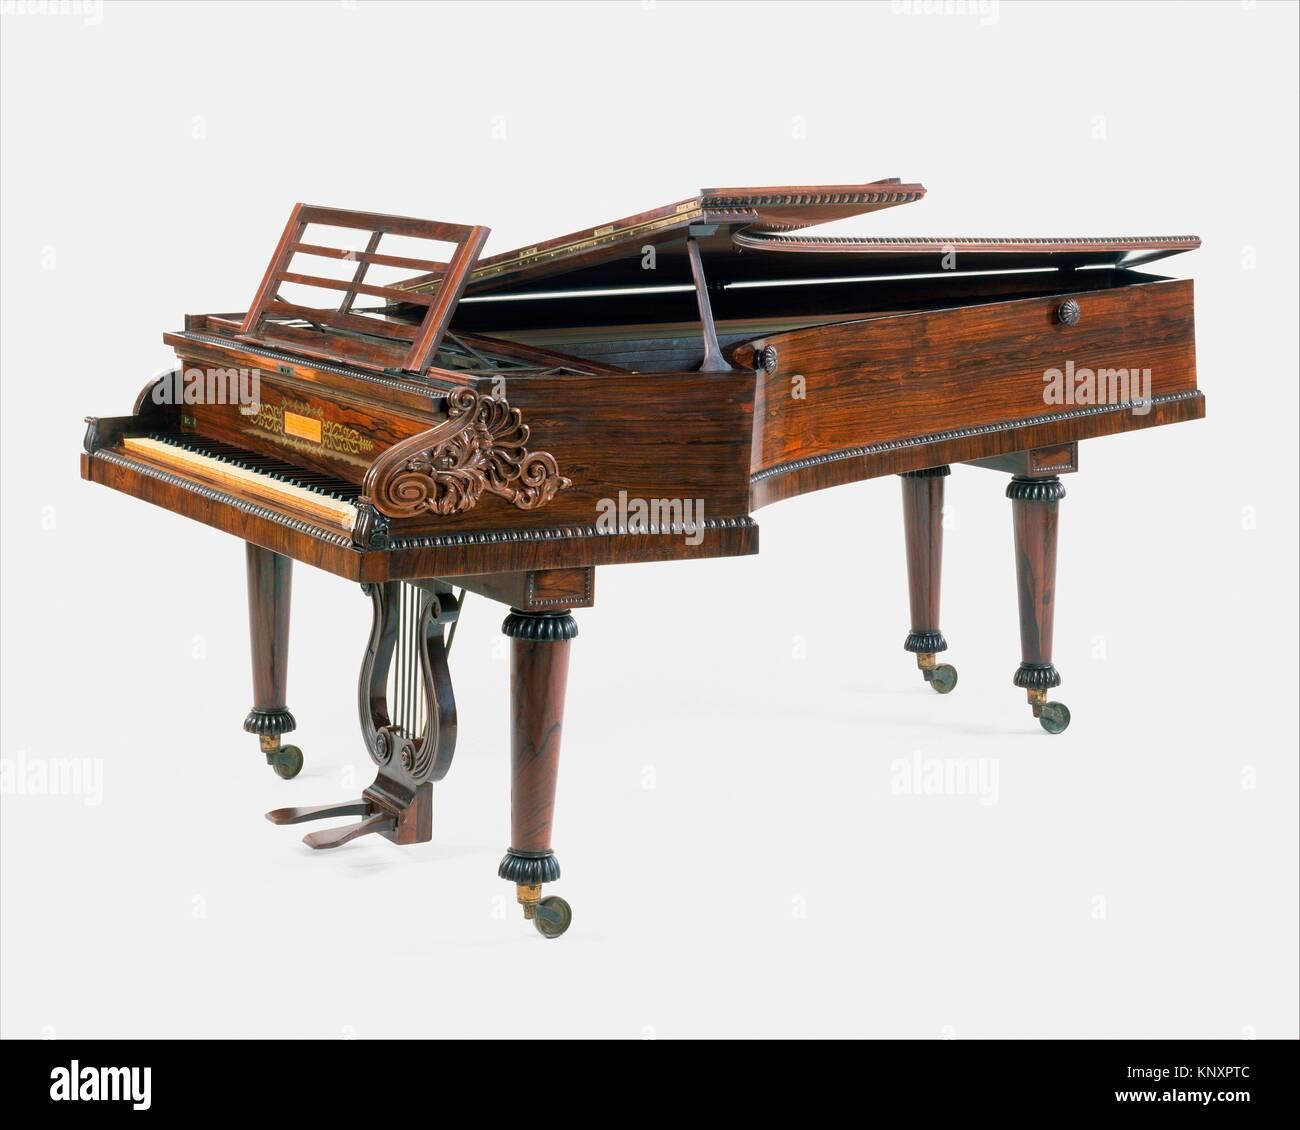 Grand Piano. Maker: John Broadwood & Sons; Date: 1827; Geography: London, England, United Kingdom; Culture: - Stock Image